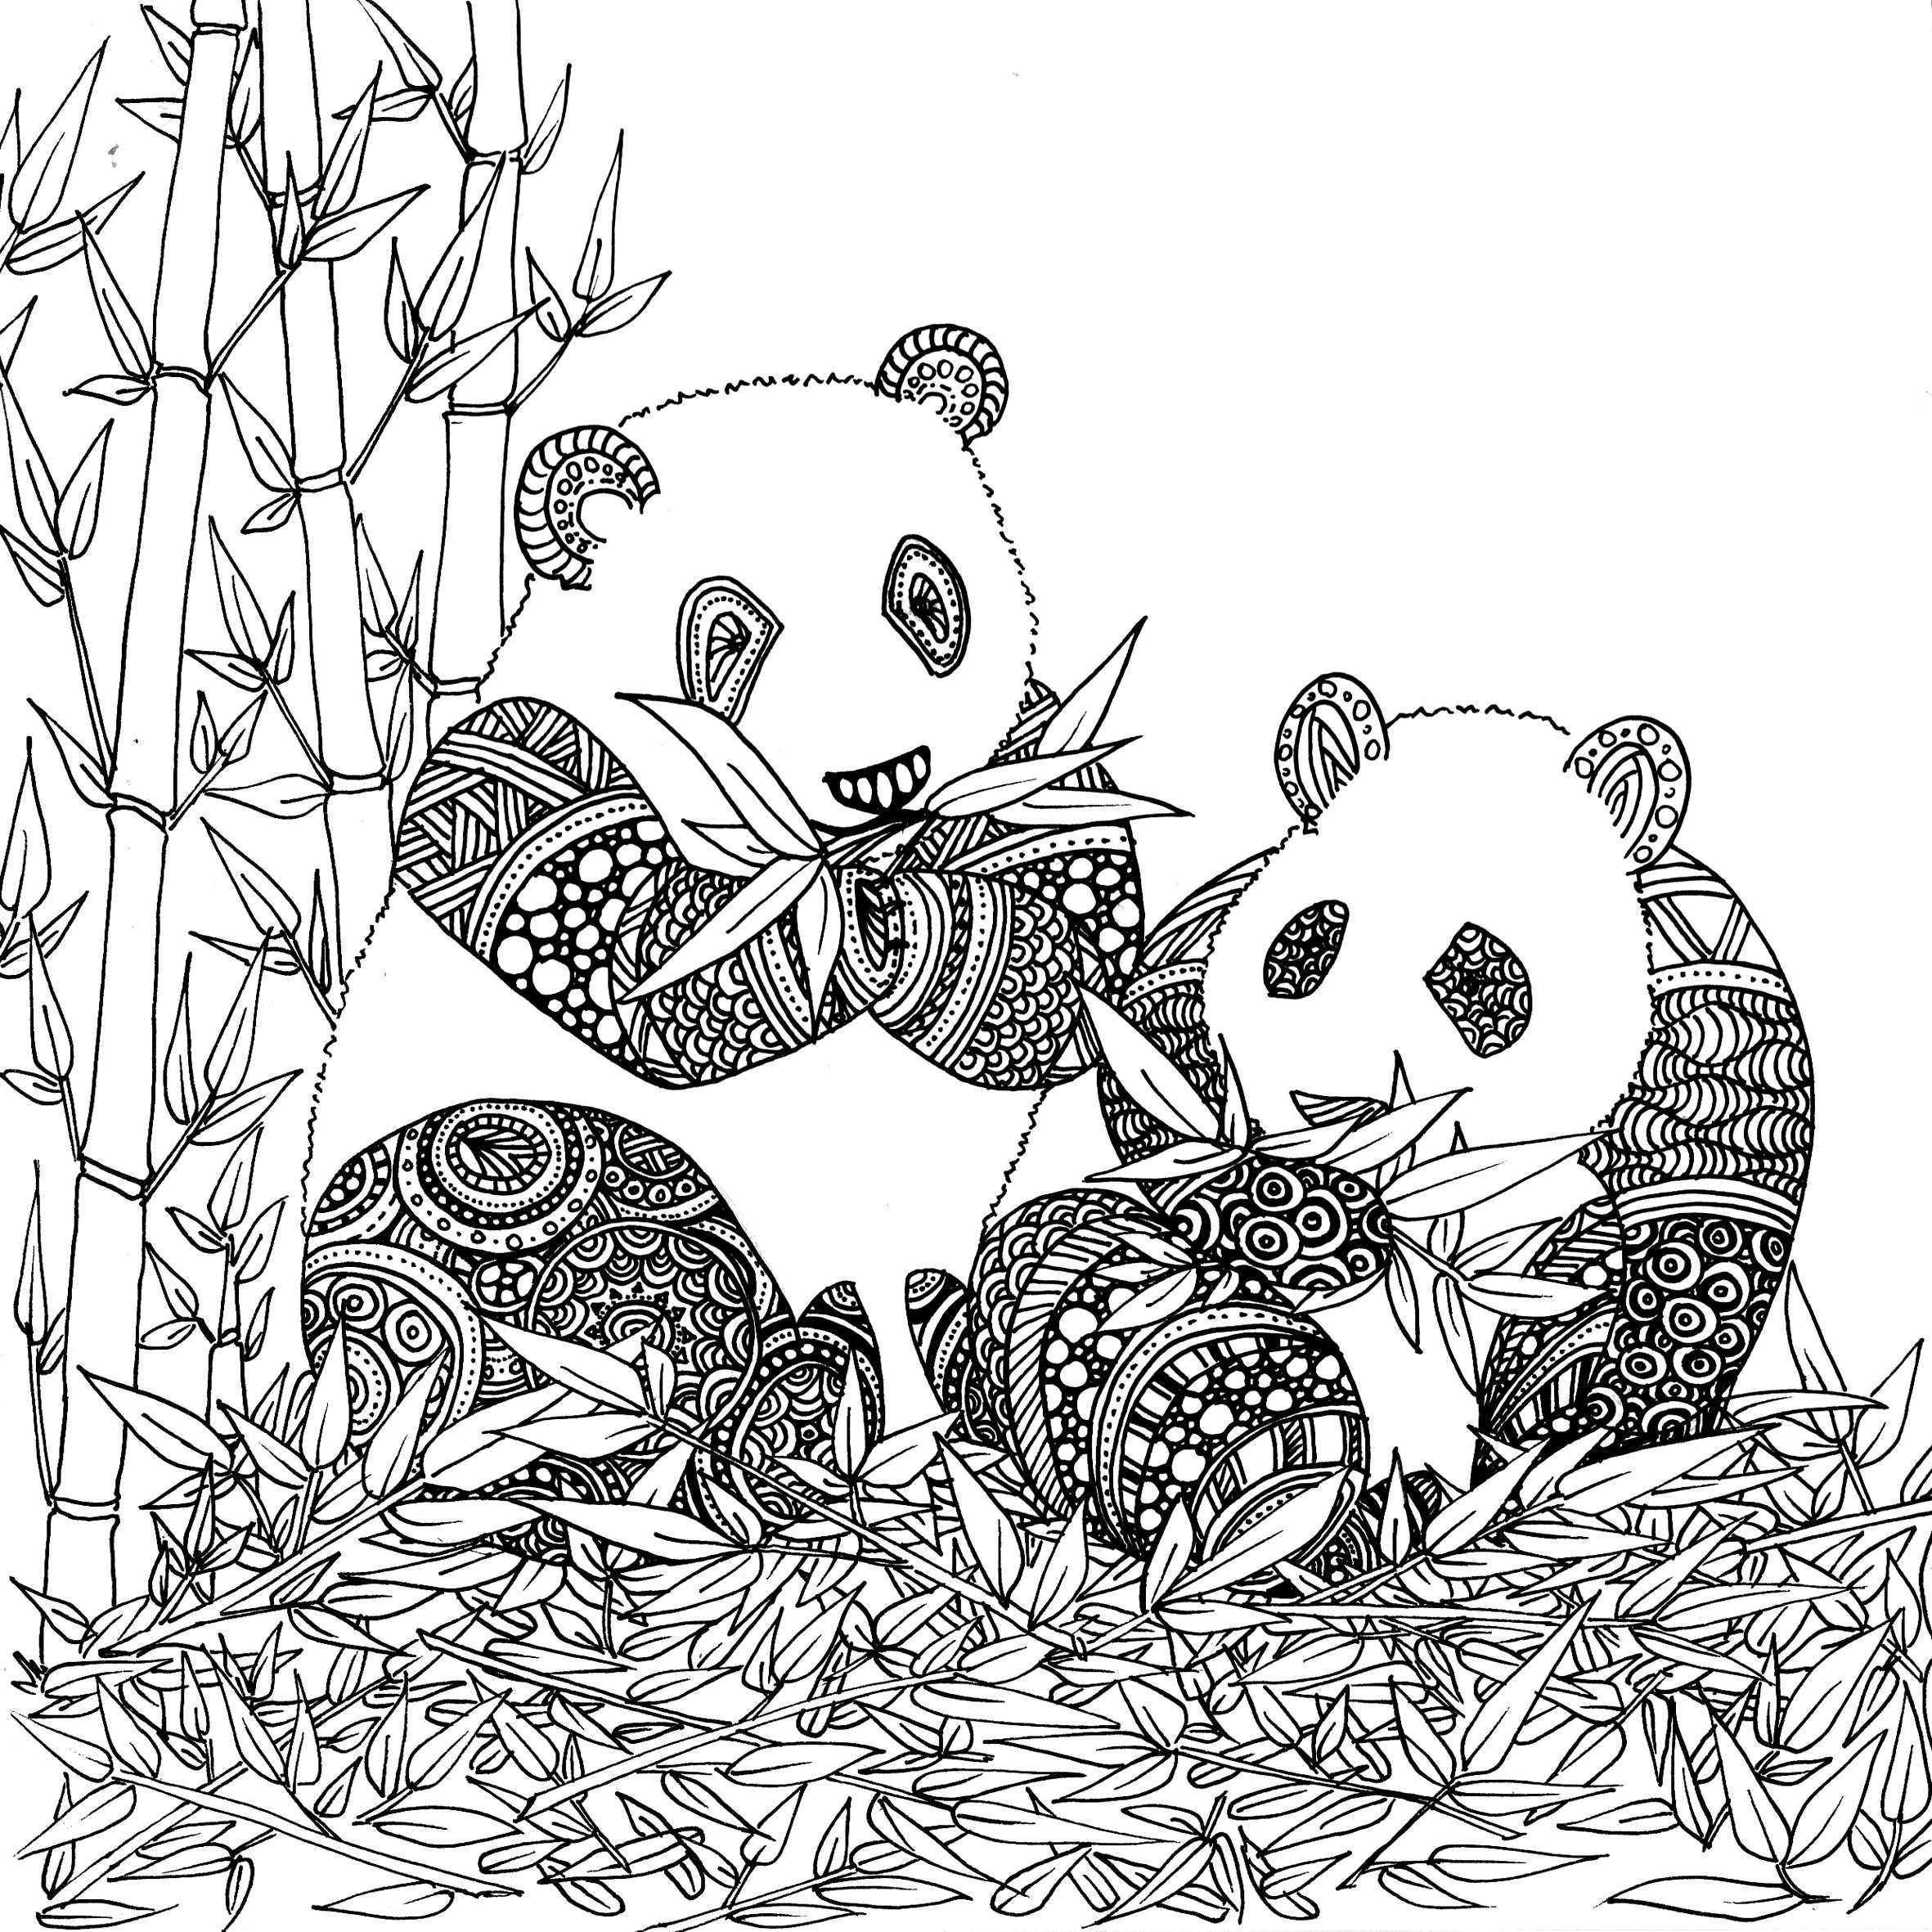 Coloriage De Animaux Panda A Imprimer Par Chocobo Artherapie Ca